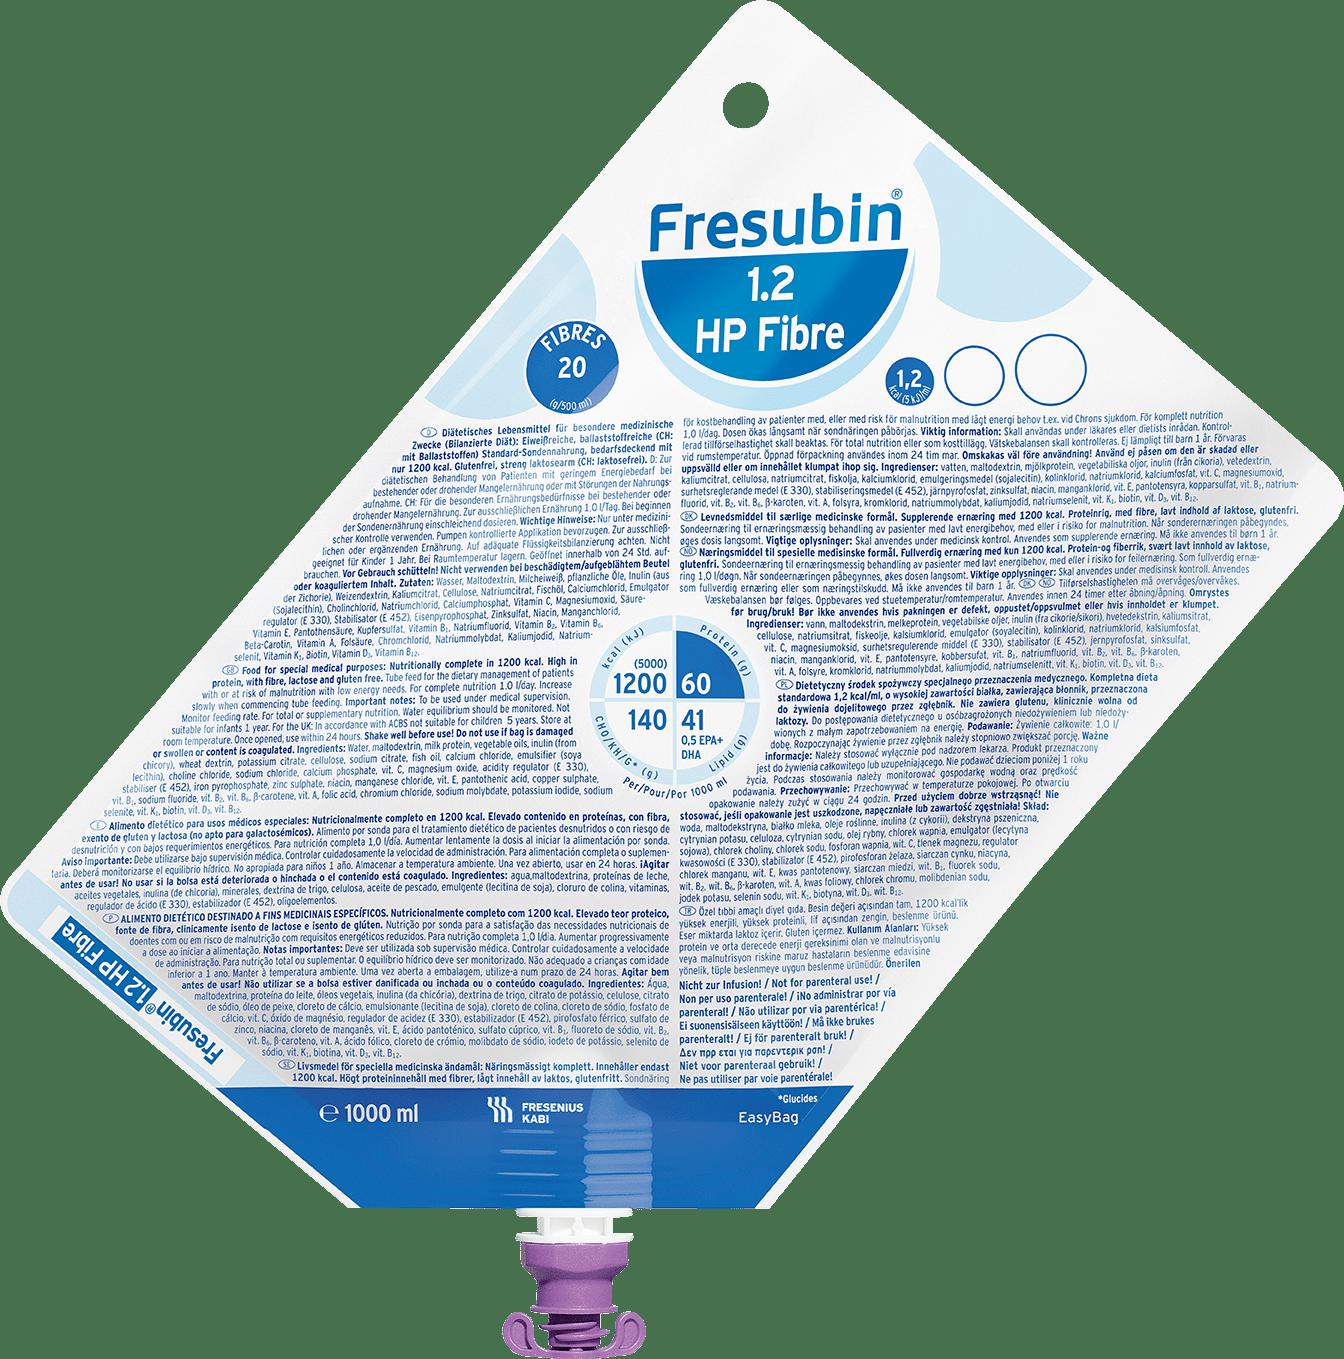 Fresubin_1.2-HP-Fibre_Int_1000ml